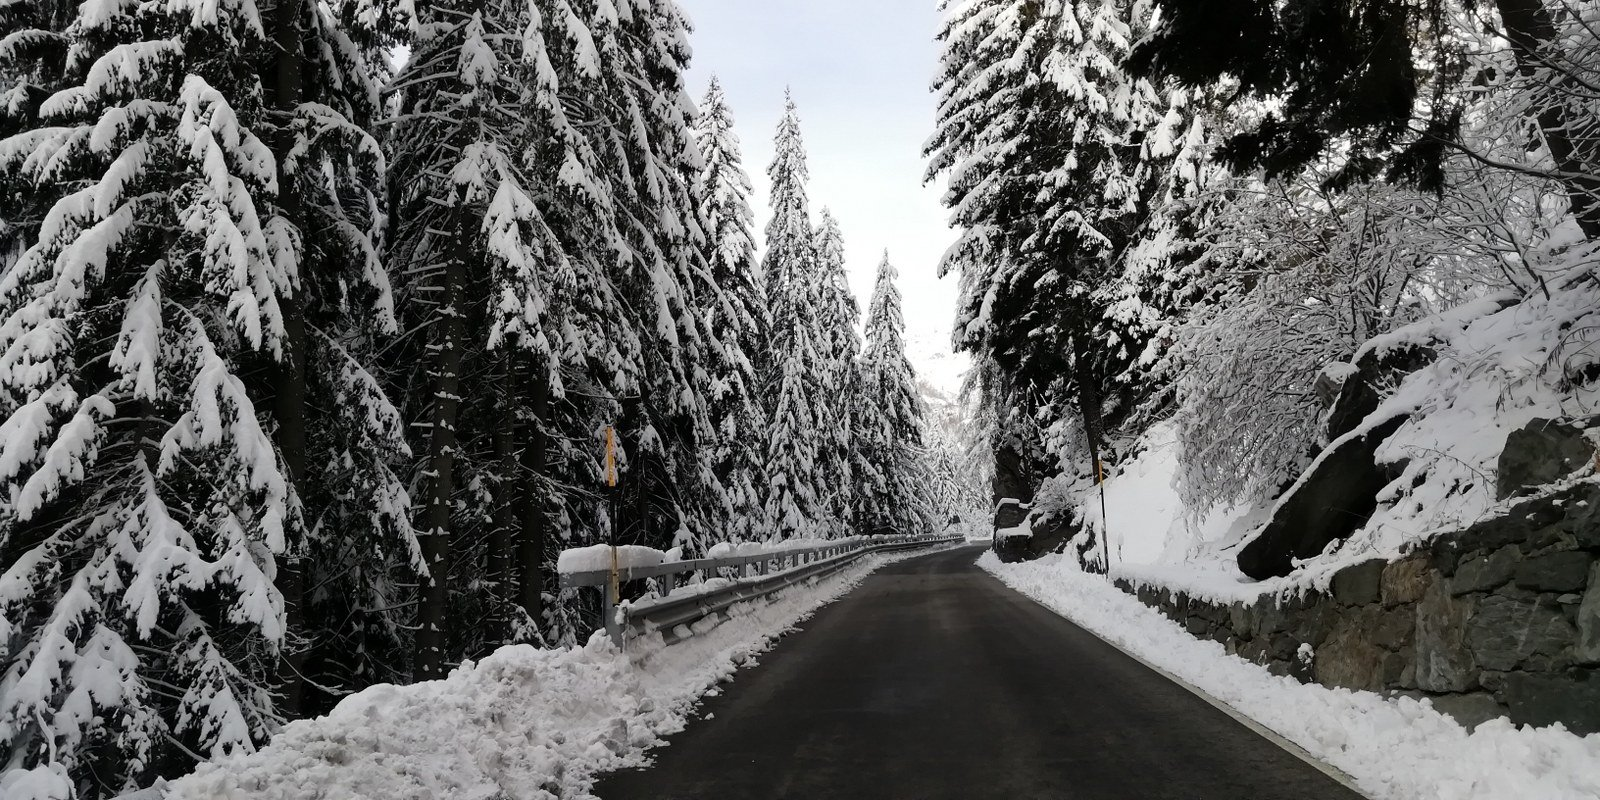 Già salendo in auto è evidente la quantità di neve caduta